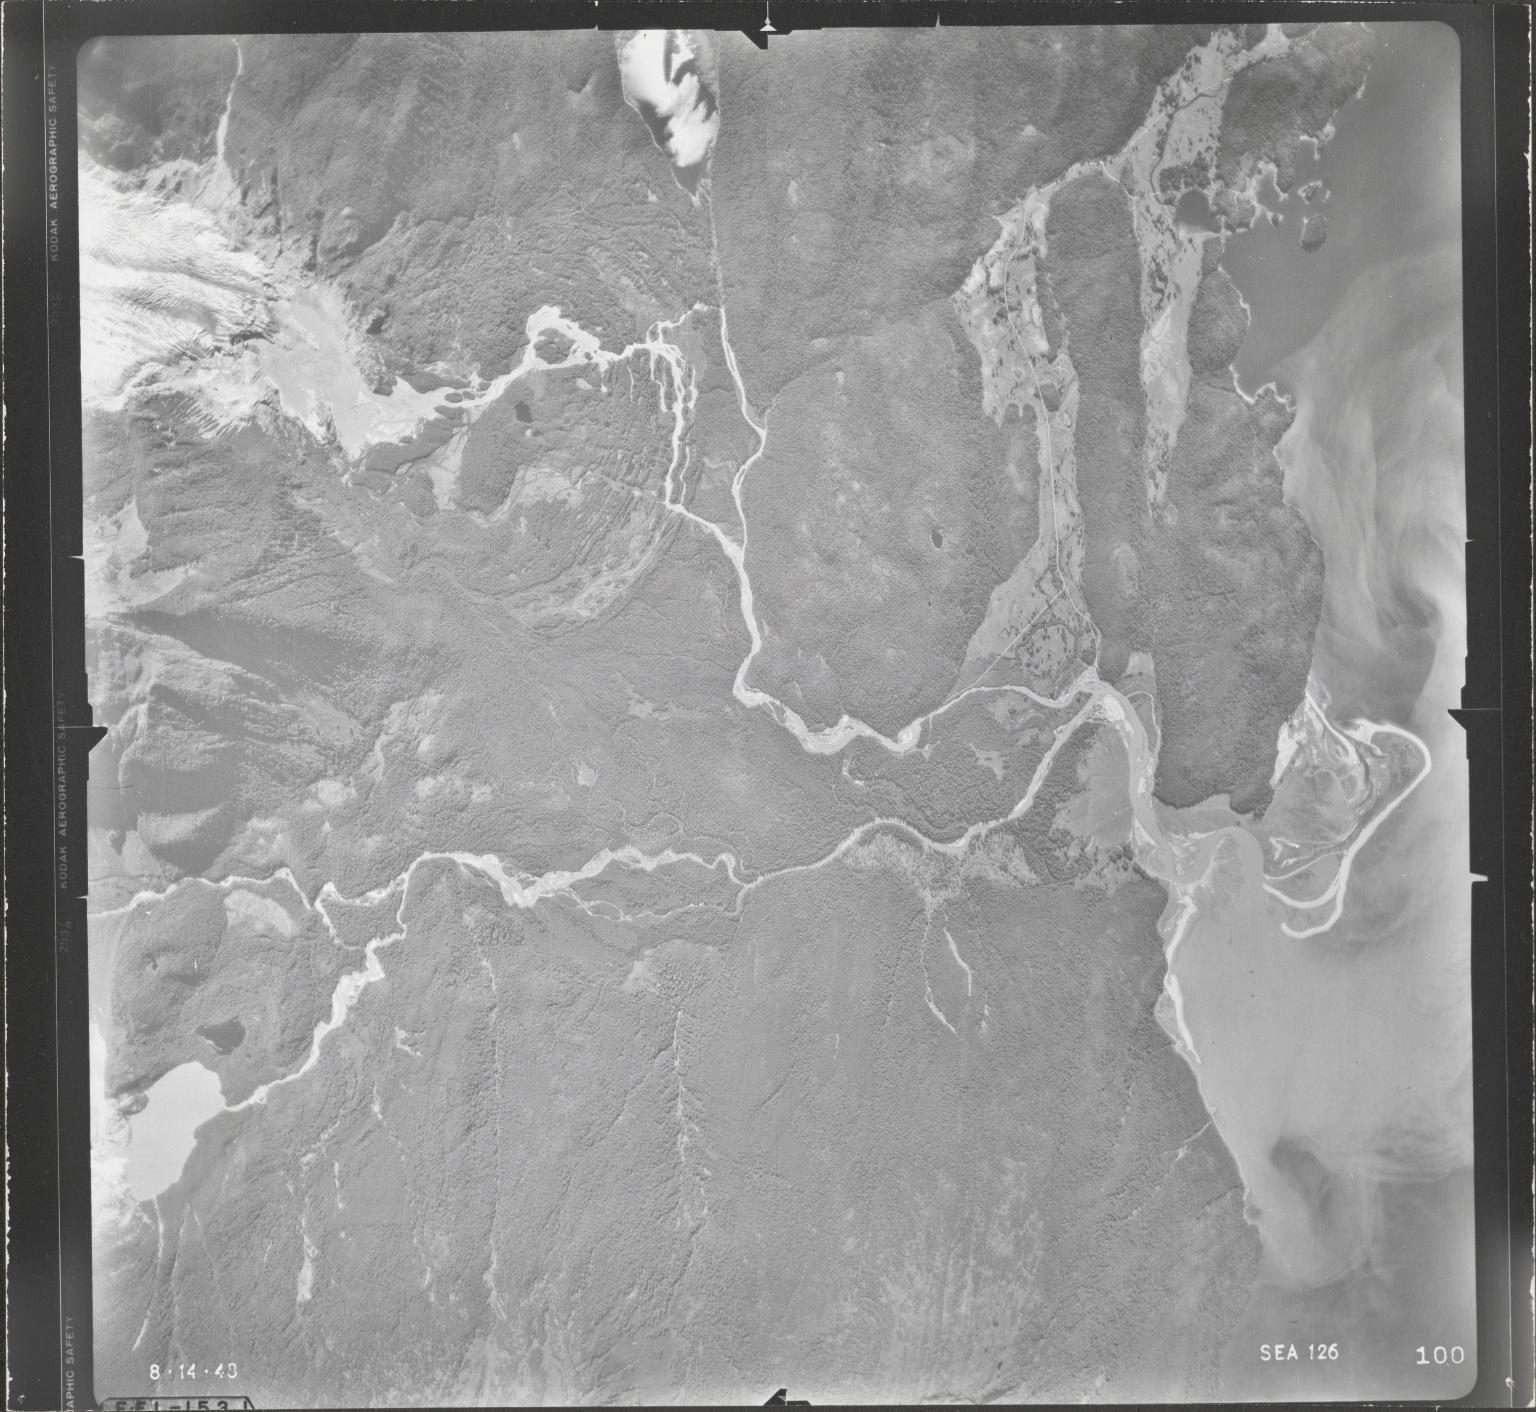 Herbert Glacier and Eagle Glacier, aerial photograph SEA 126 100, Alaska